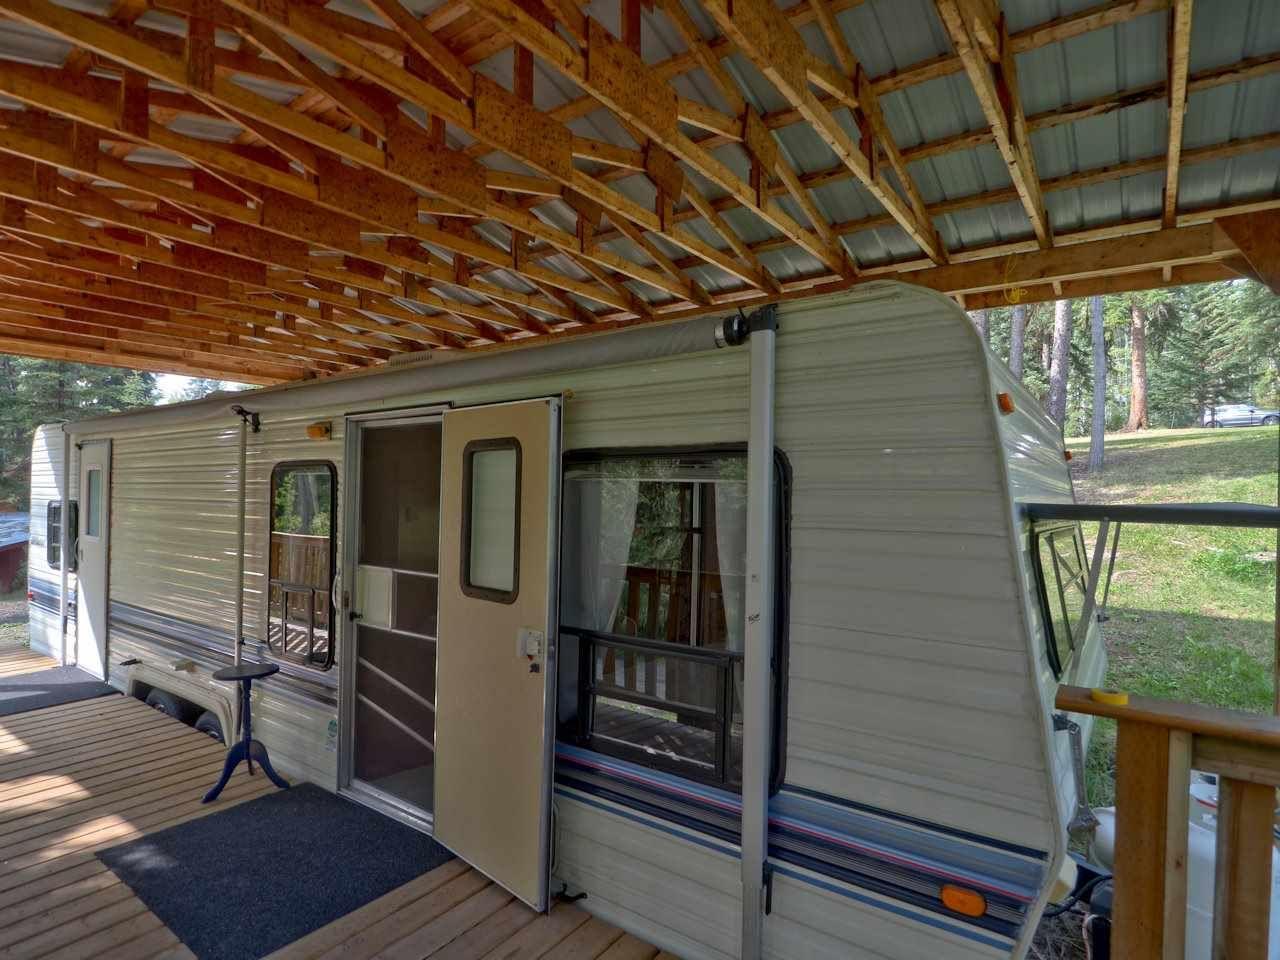 Photo 19: Photos: 7271 NATH Road in Bridge Lake: Bridge Lake/Sheridan Lake Land for sale (100 Mile House (Zone 10))  : MLS®# R2496086